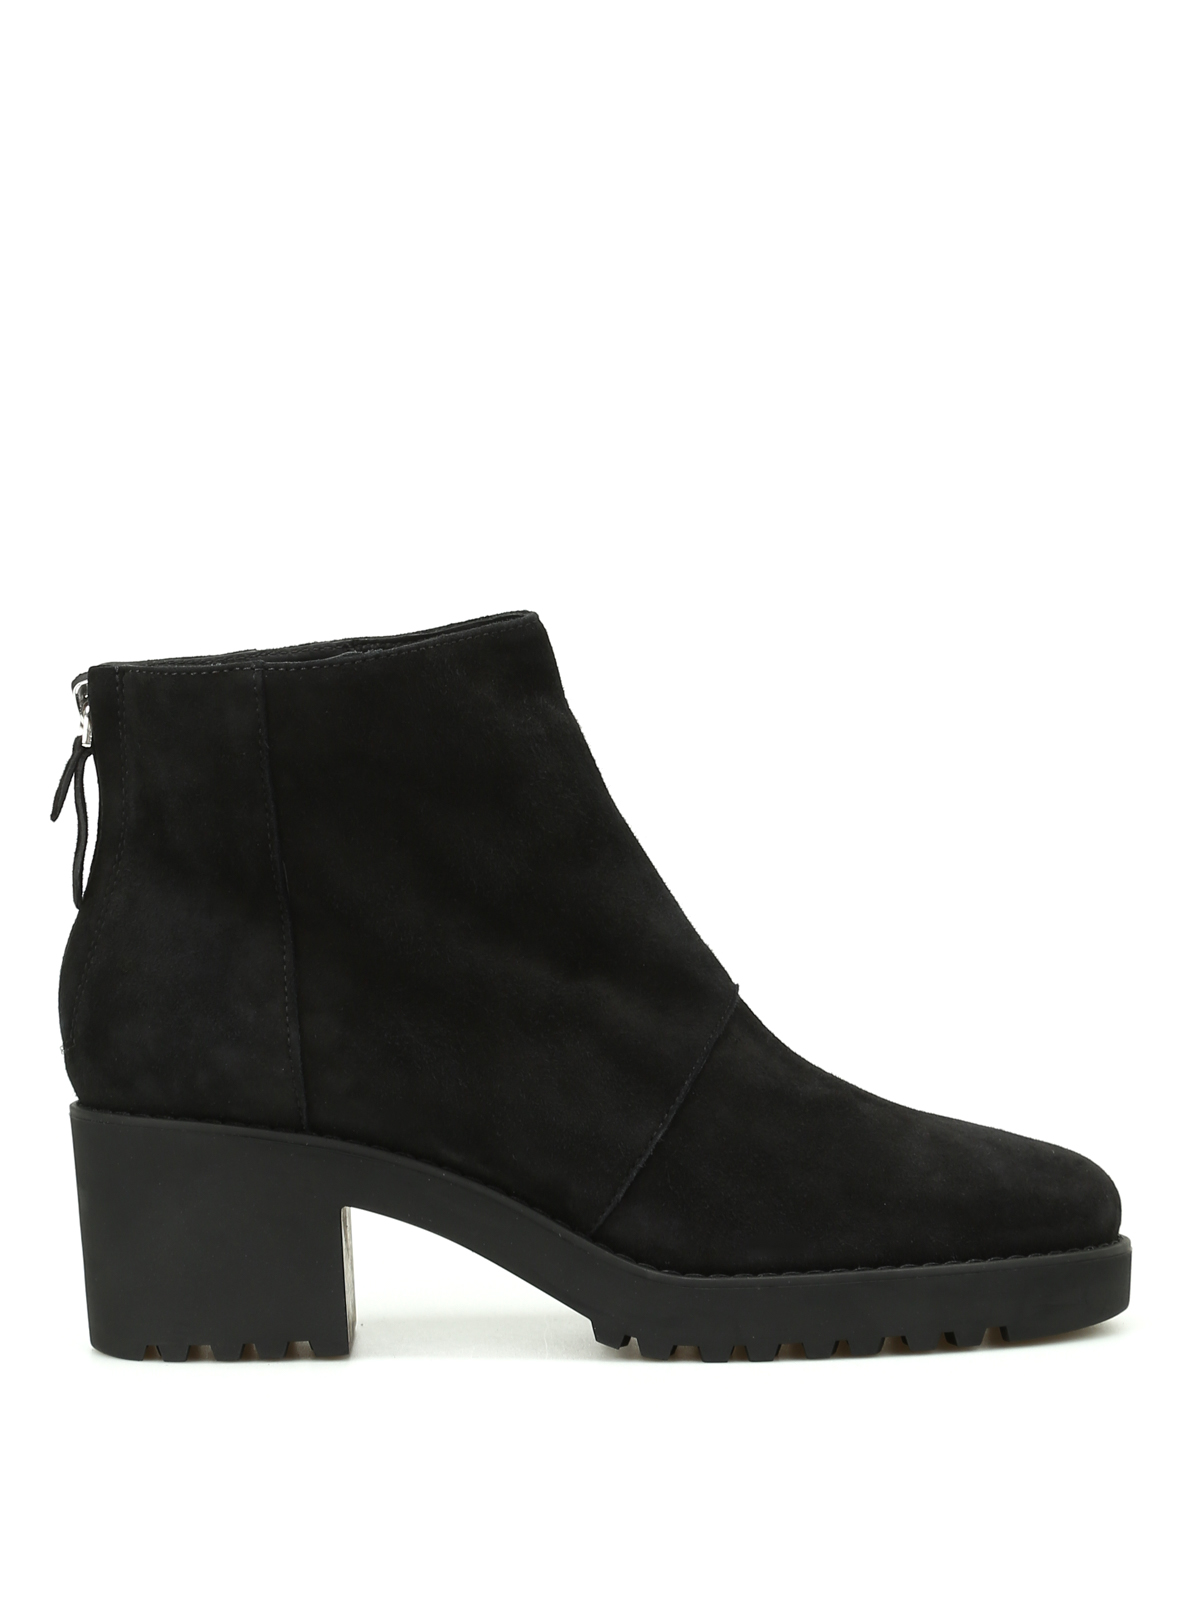 4e07da72cc Hogan - H277 zipped suede ankle boots - ankle boots - HXW2770Z620CR0B999